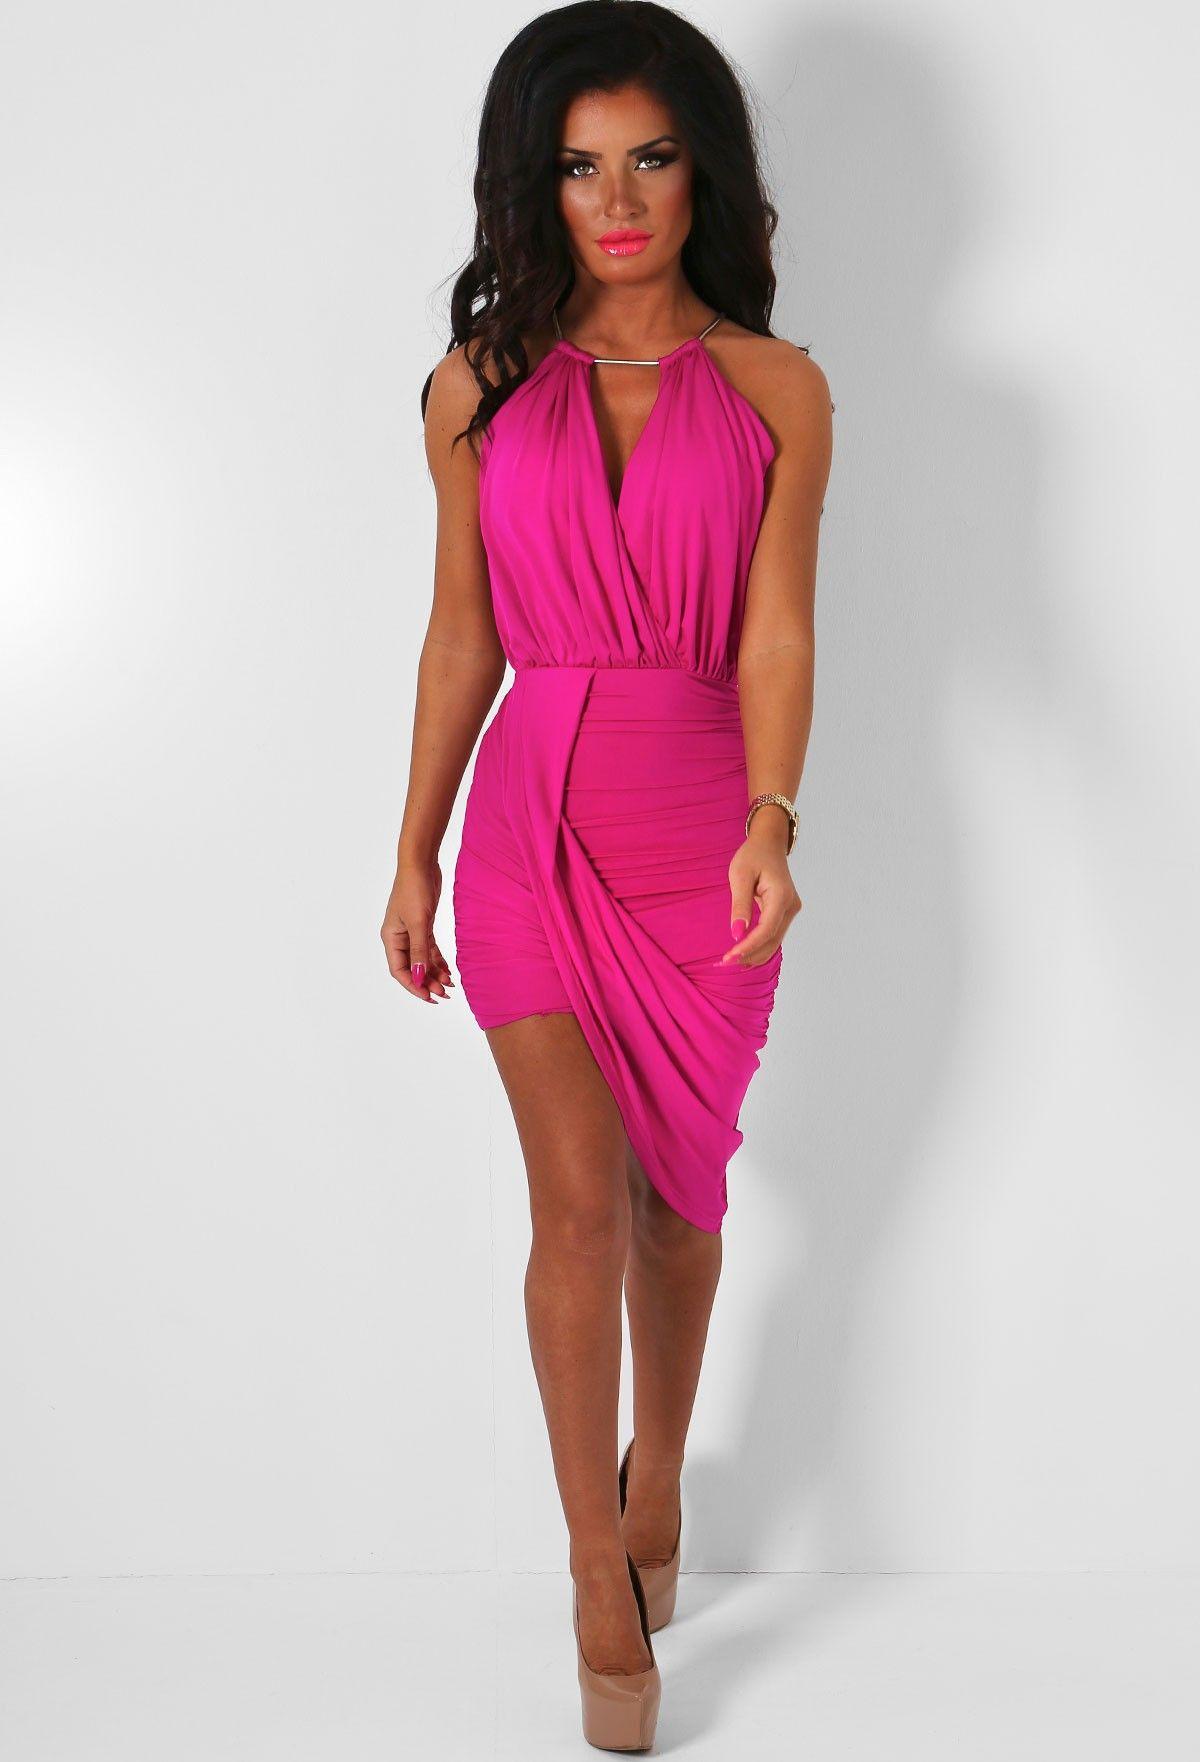 ❤ ❤ ❤ ❤ | vestidos | Pinterest | Inspire clothing, Boutique ...